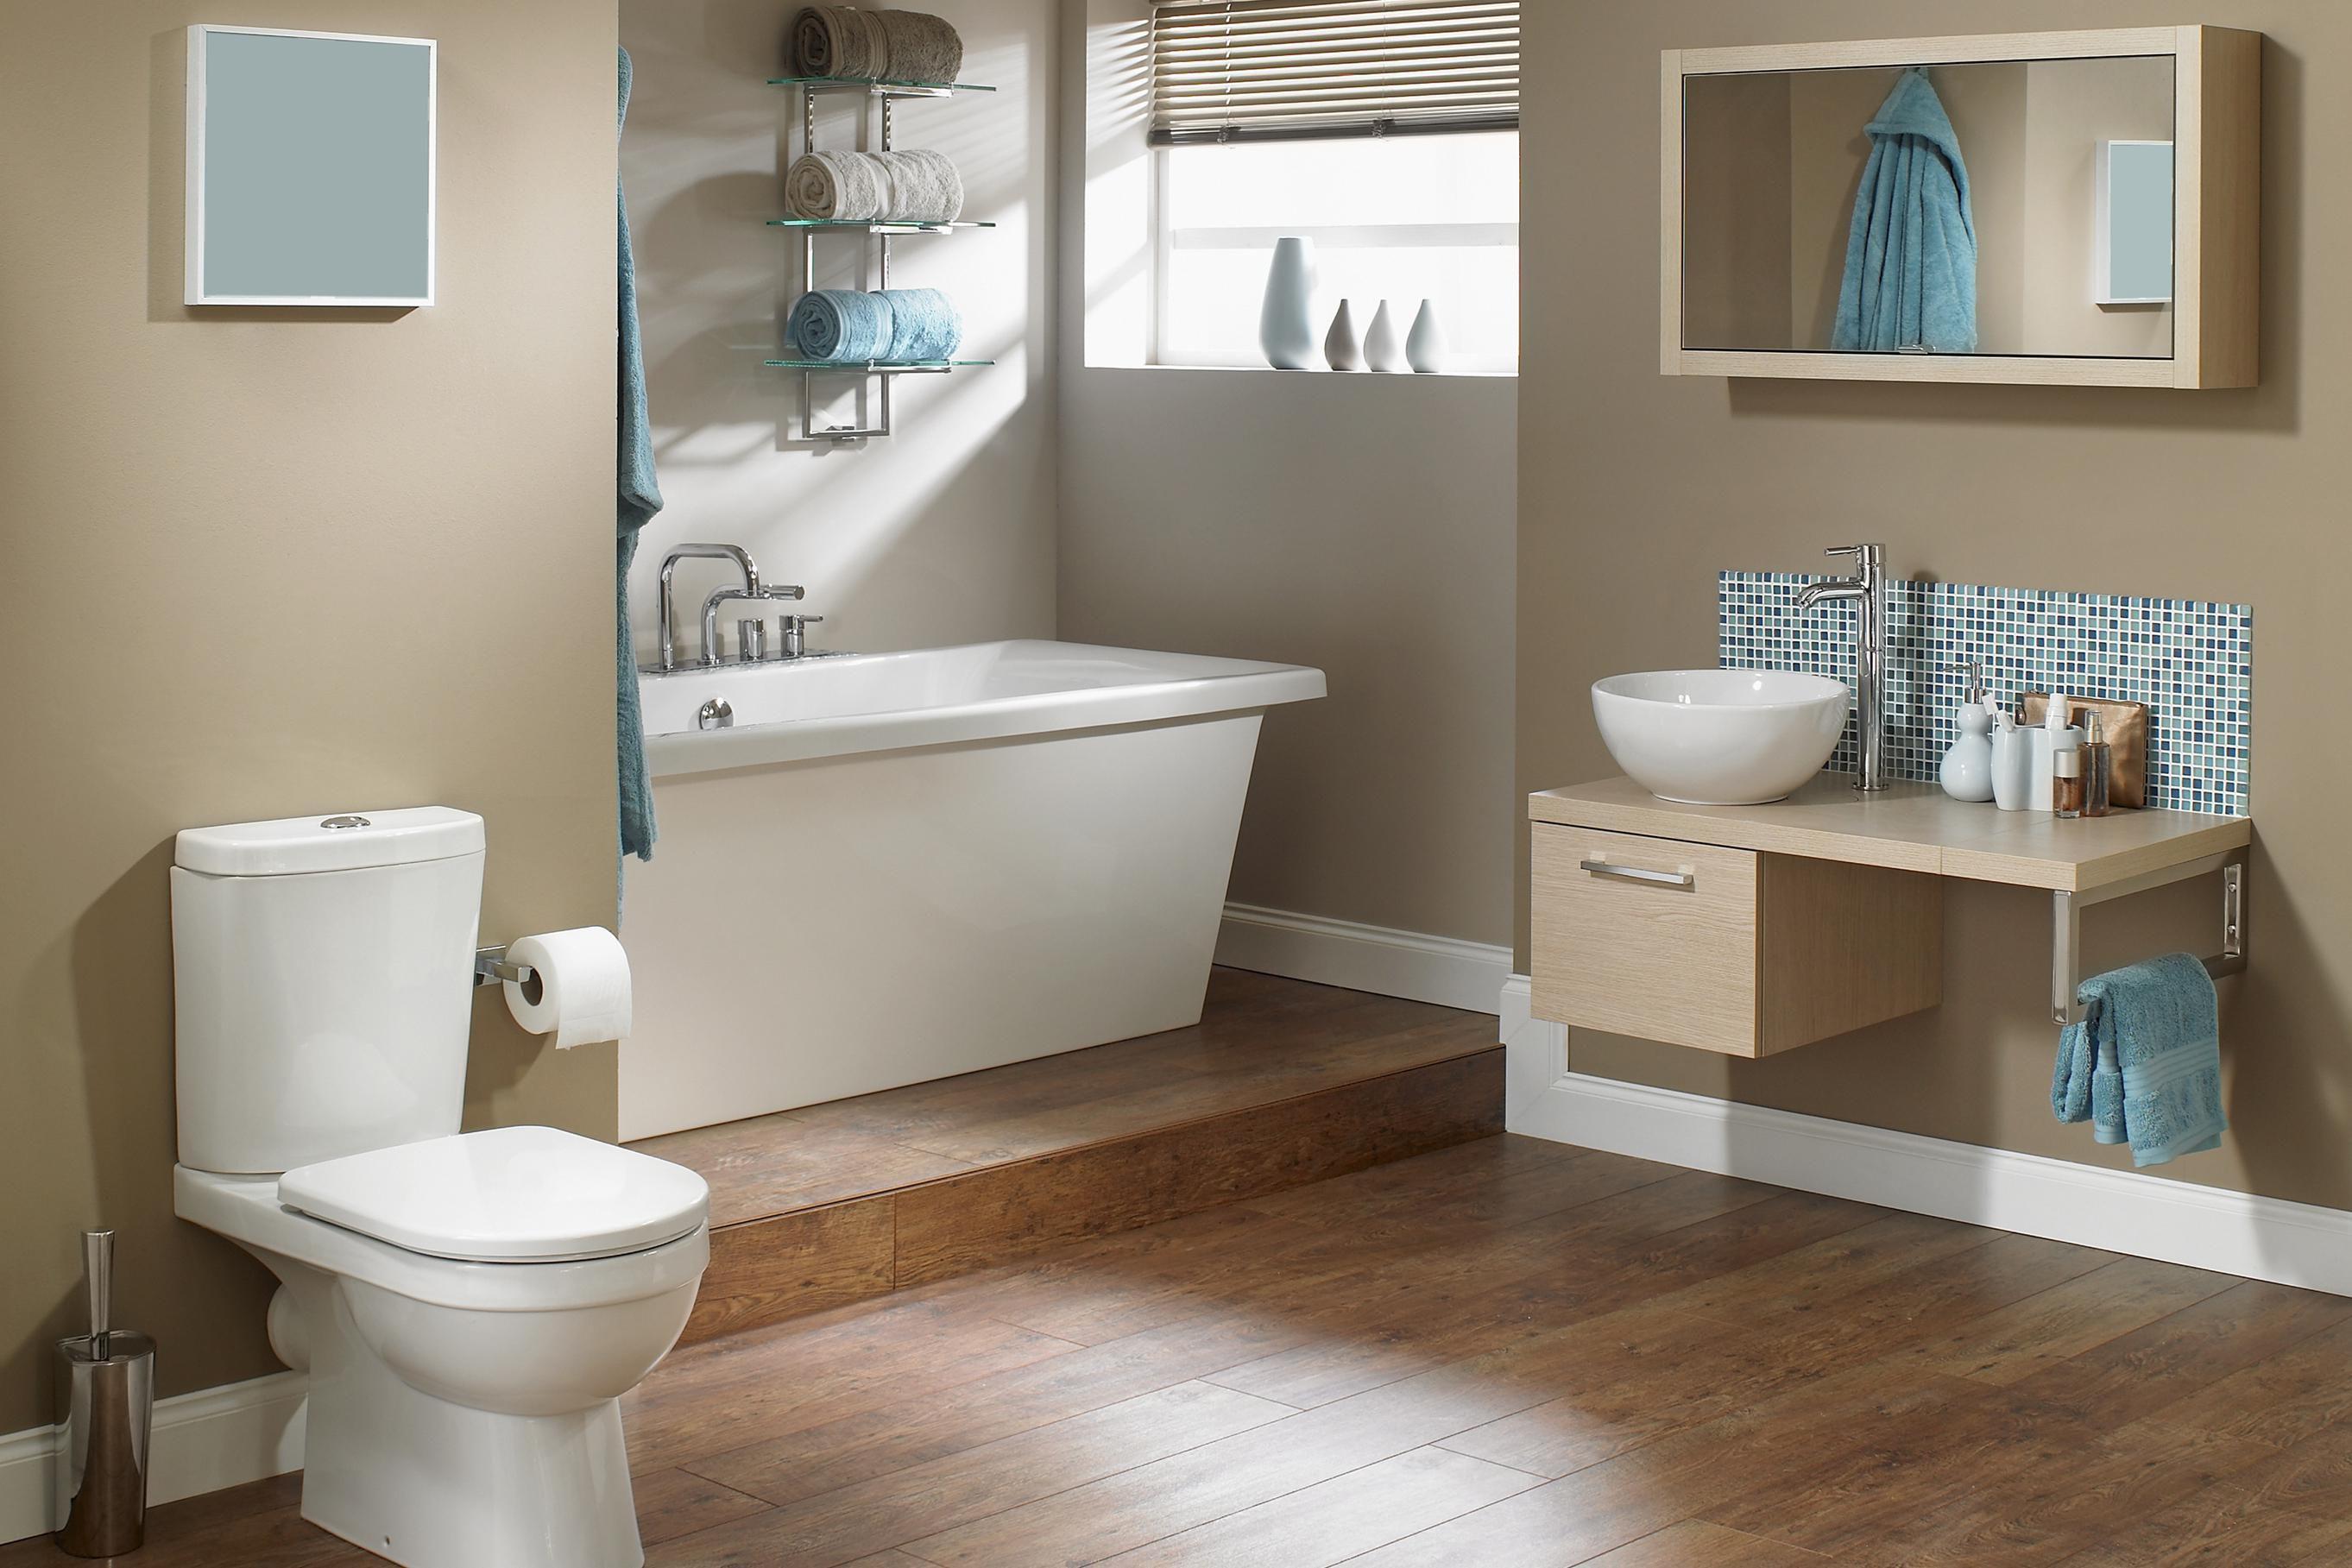 Bathroom Renovation Design Tips And Remodeling Advice